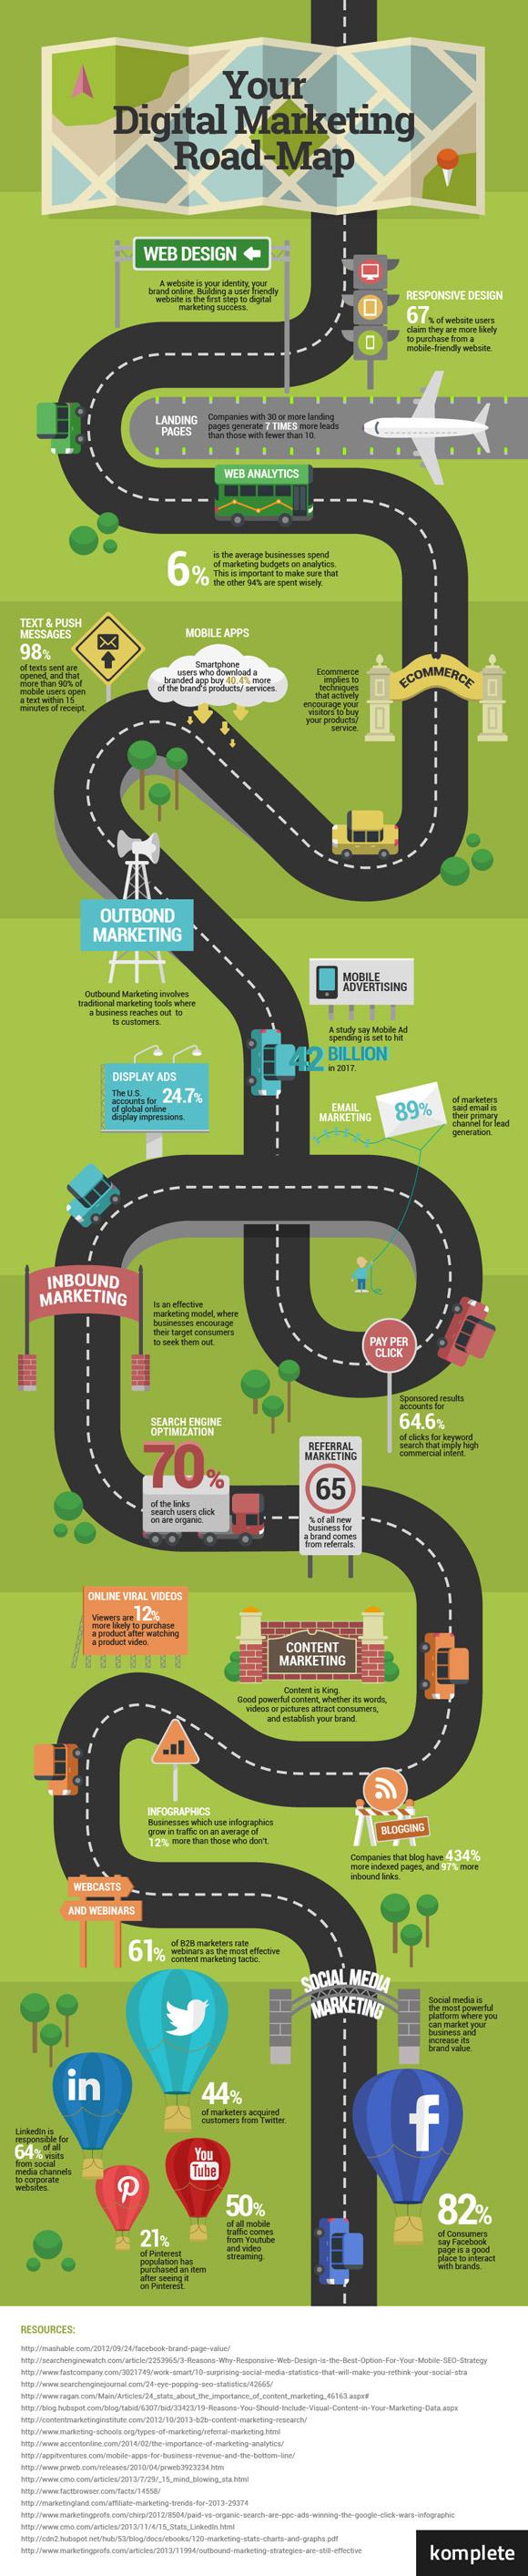 infografia camino al marketing digital